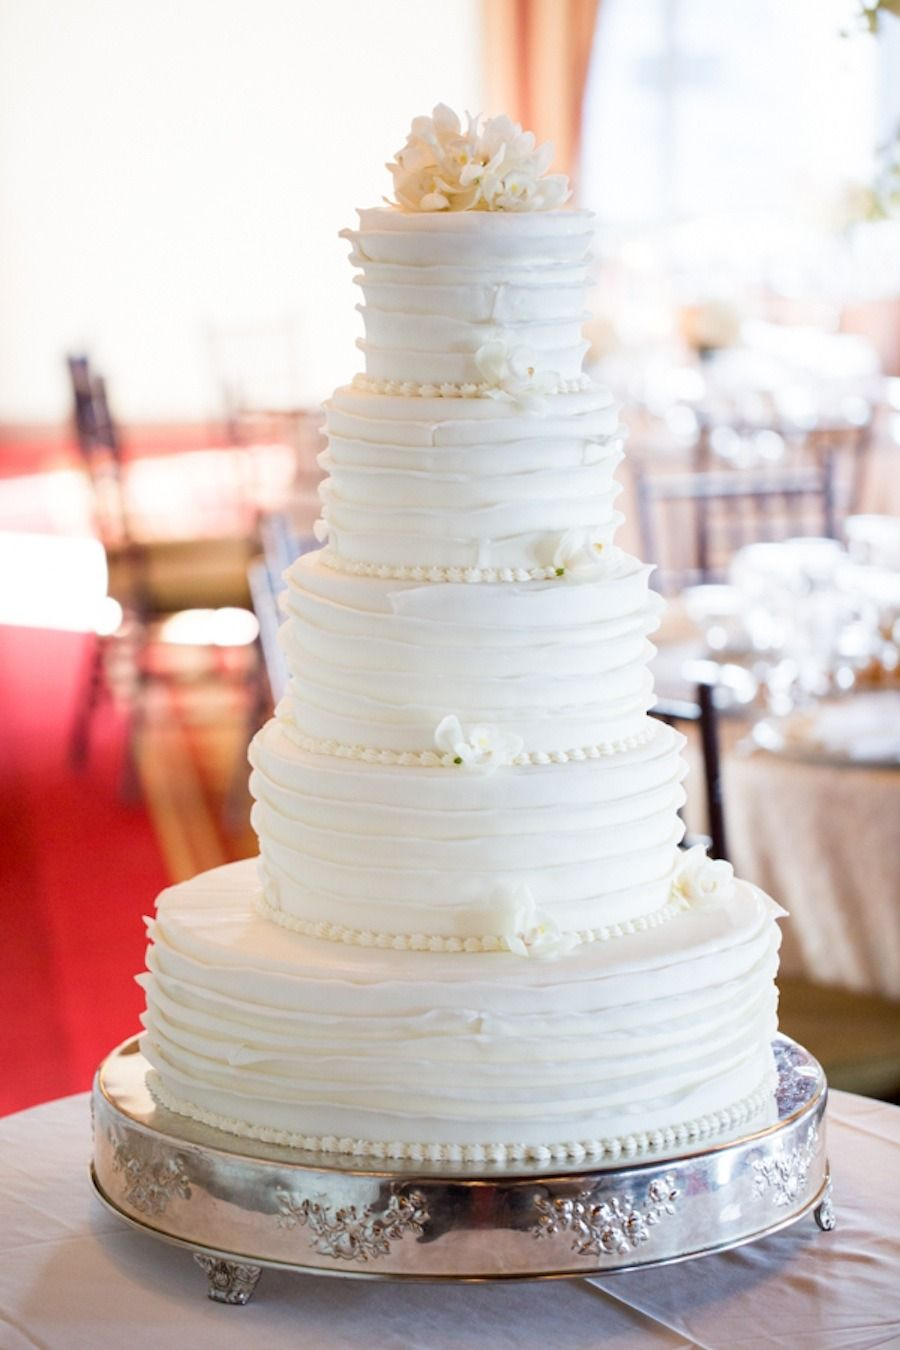 New York Athletic Club Wedding   Pinterest   Wedding cake, Athletic ...